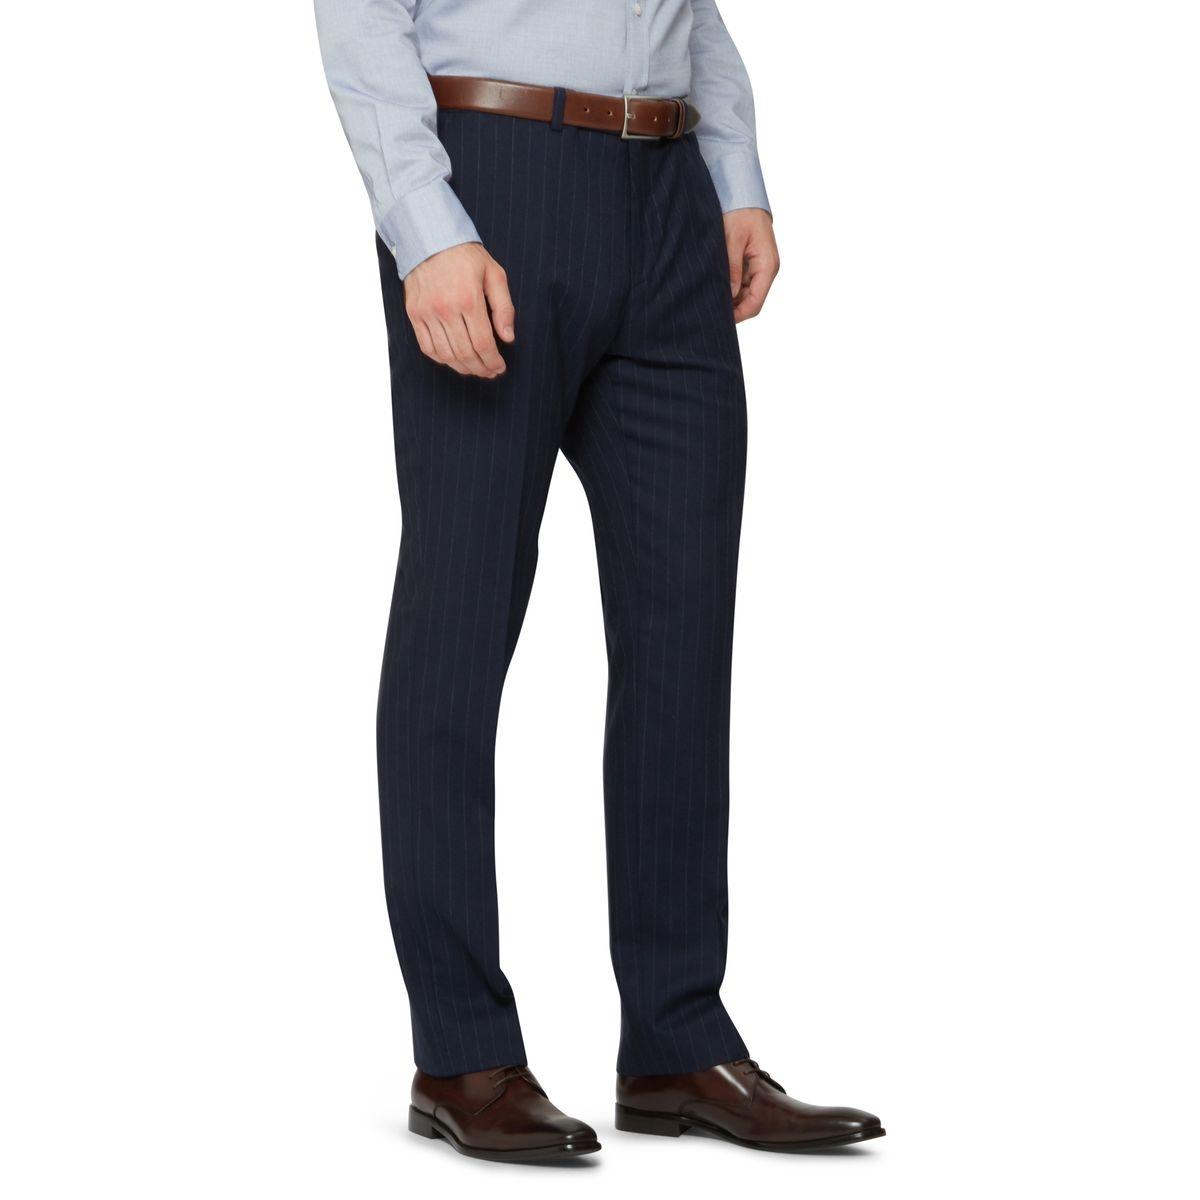 Pantalon rayé coupe ajustée